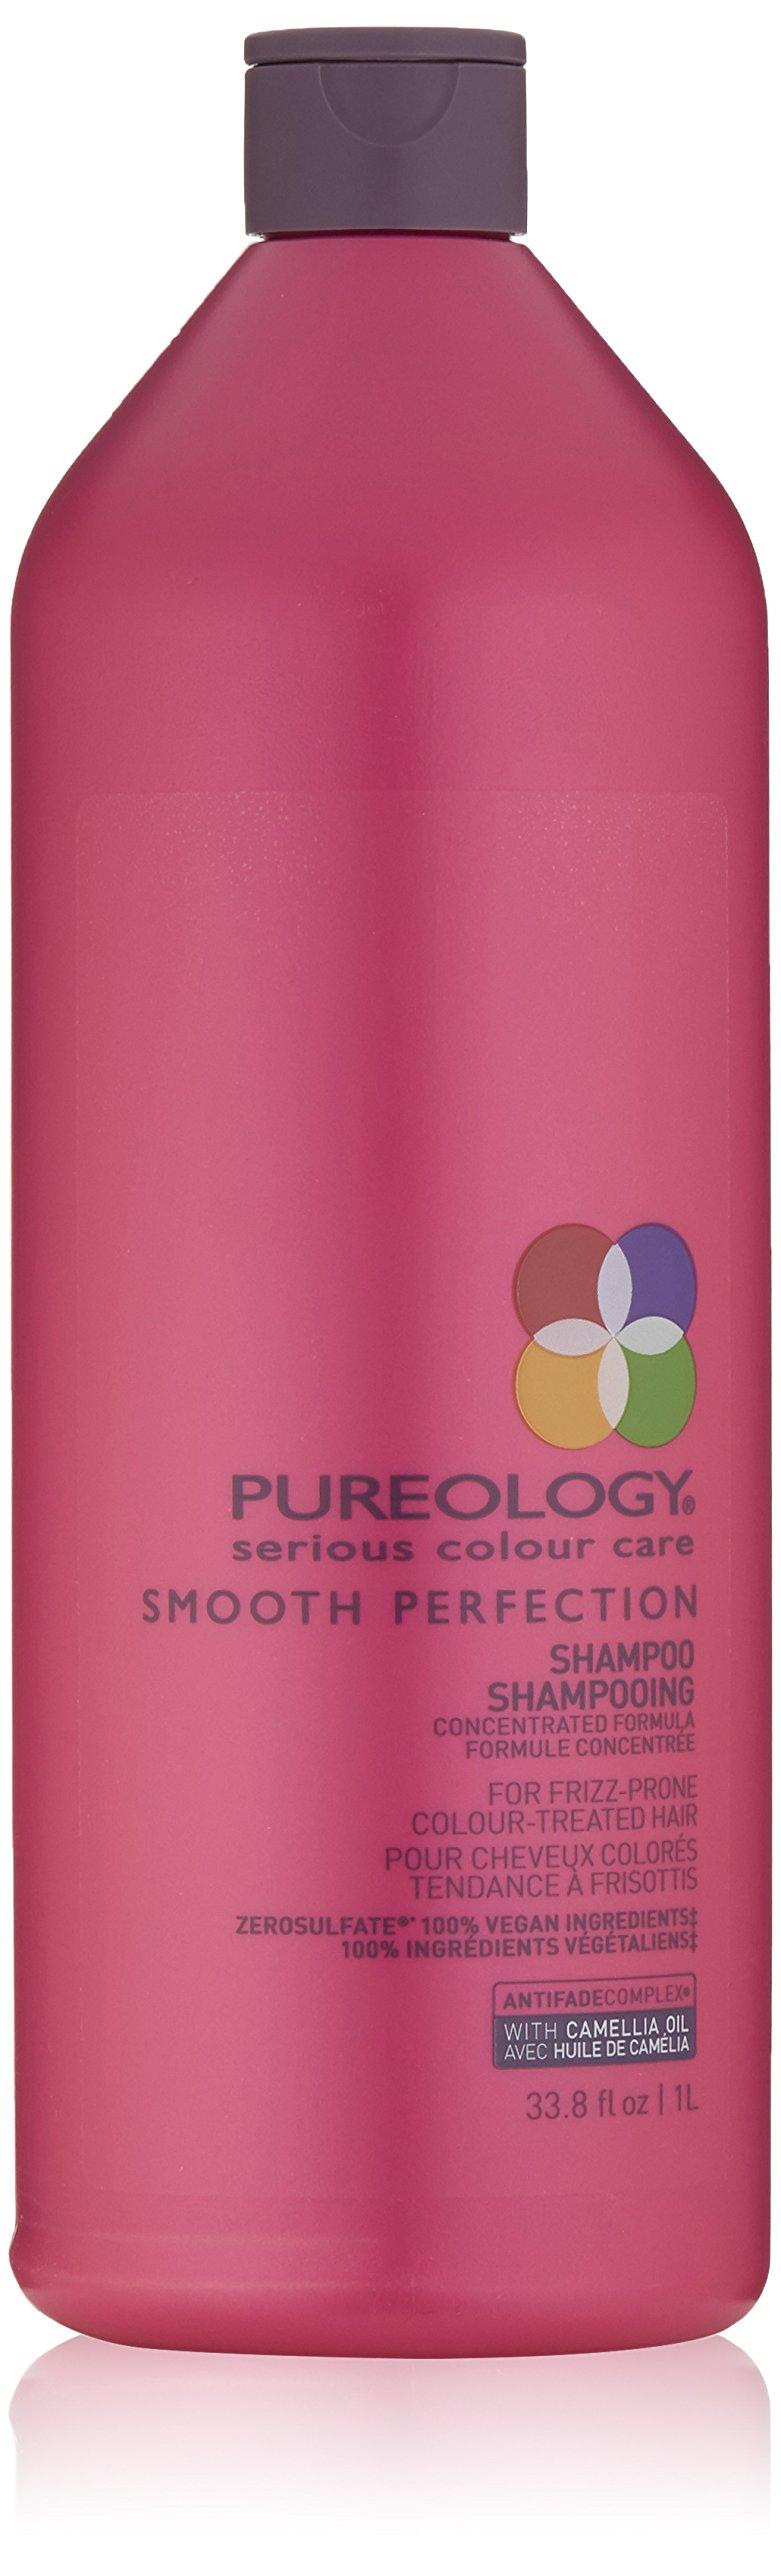 Pureology Smooth Perfection Shampoo, 33.8 Fl Oz